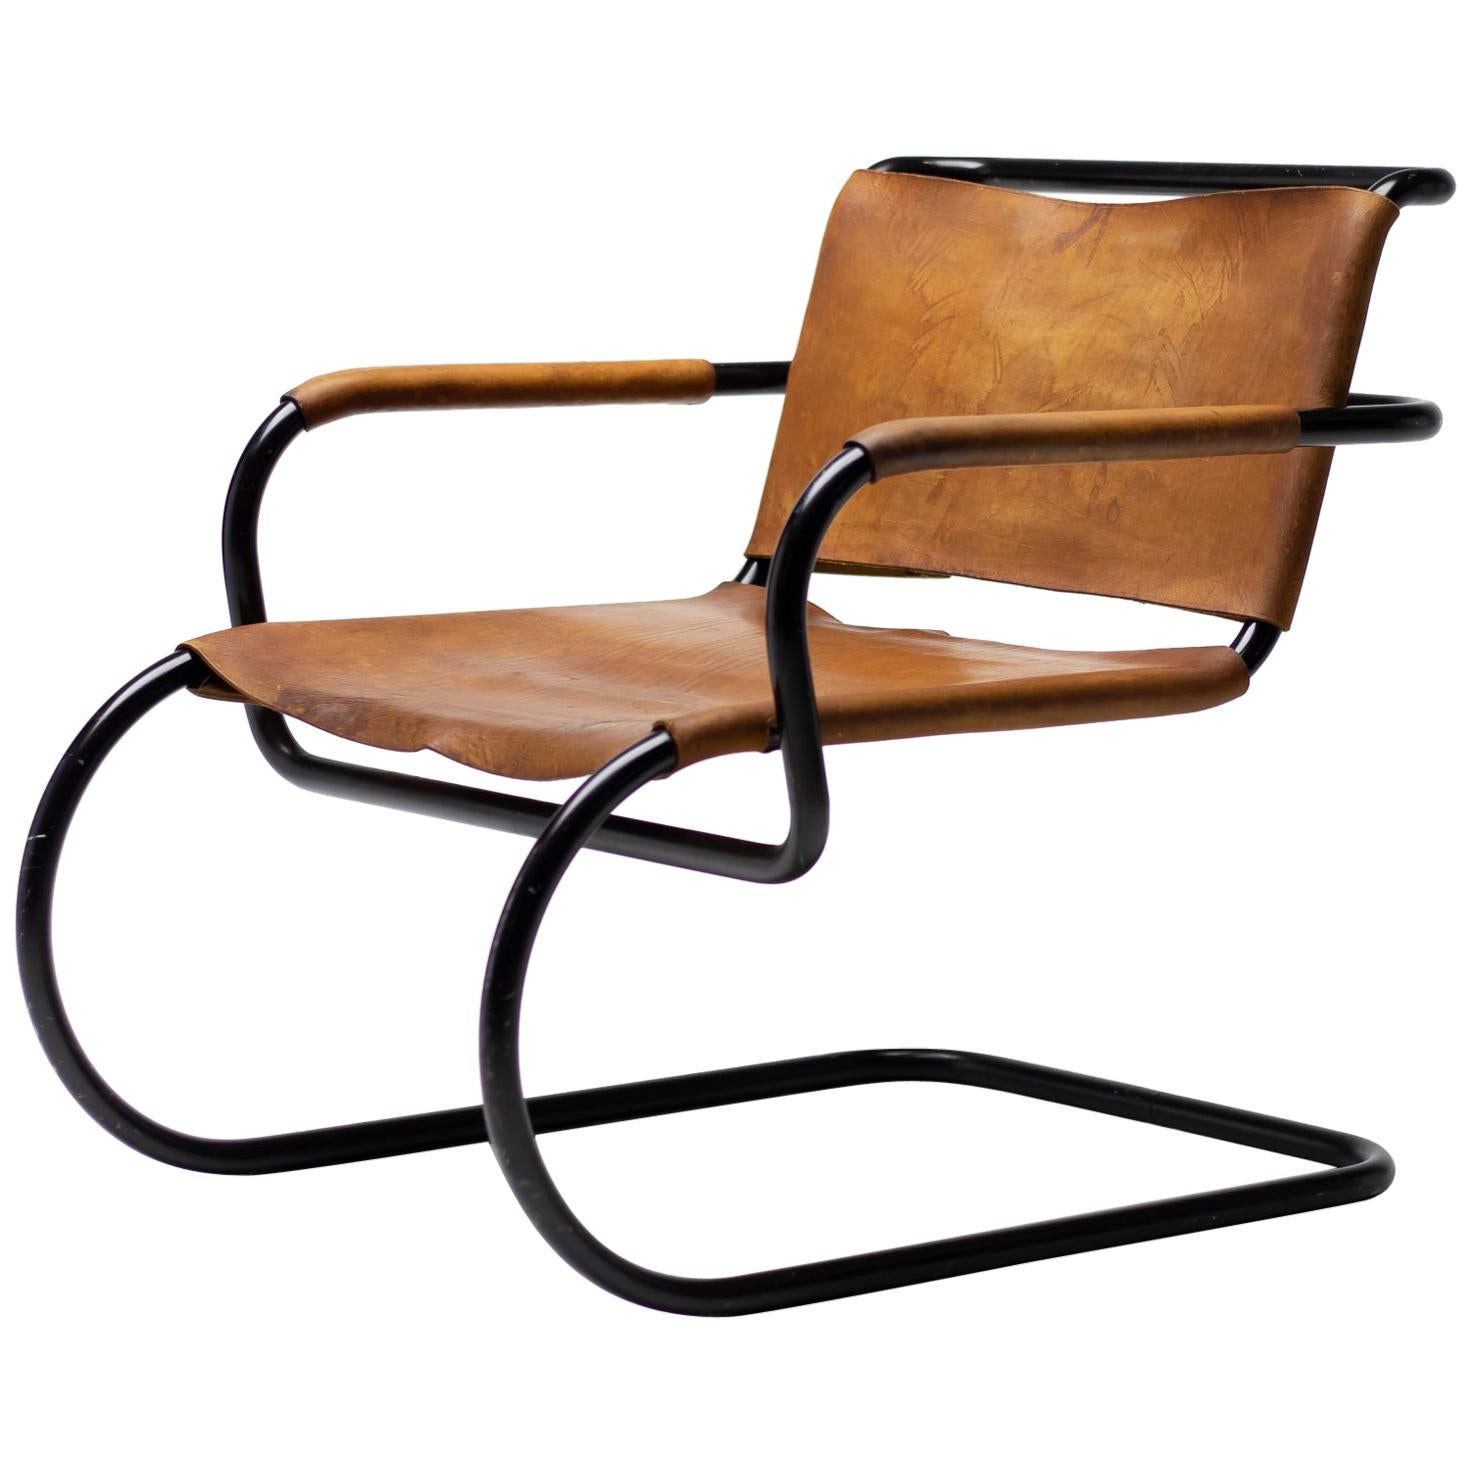 Franco Albini 1933 Triennale Lounge Chair